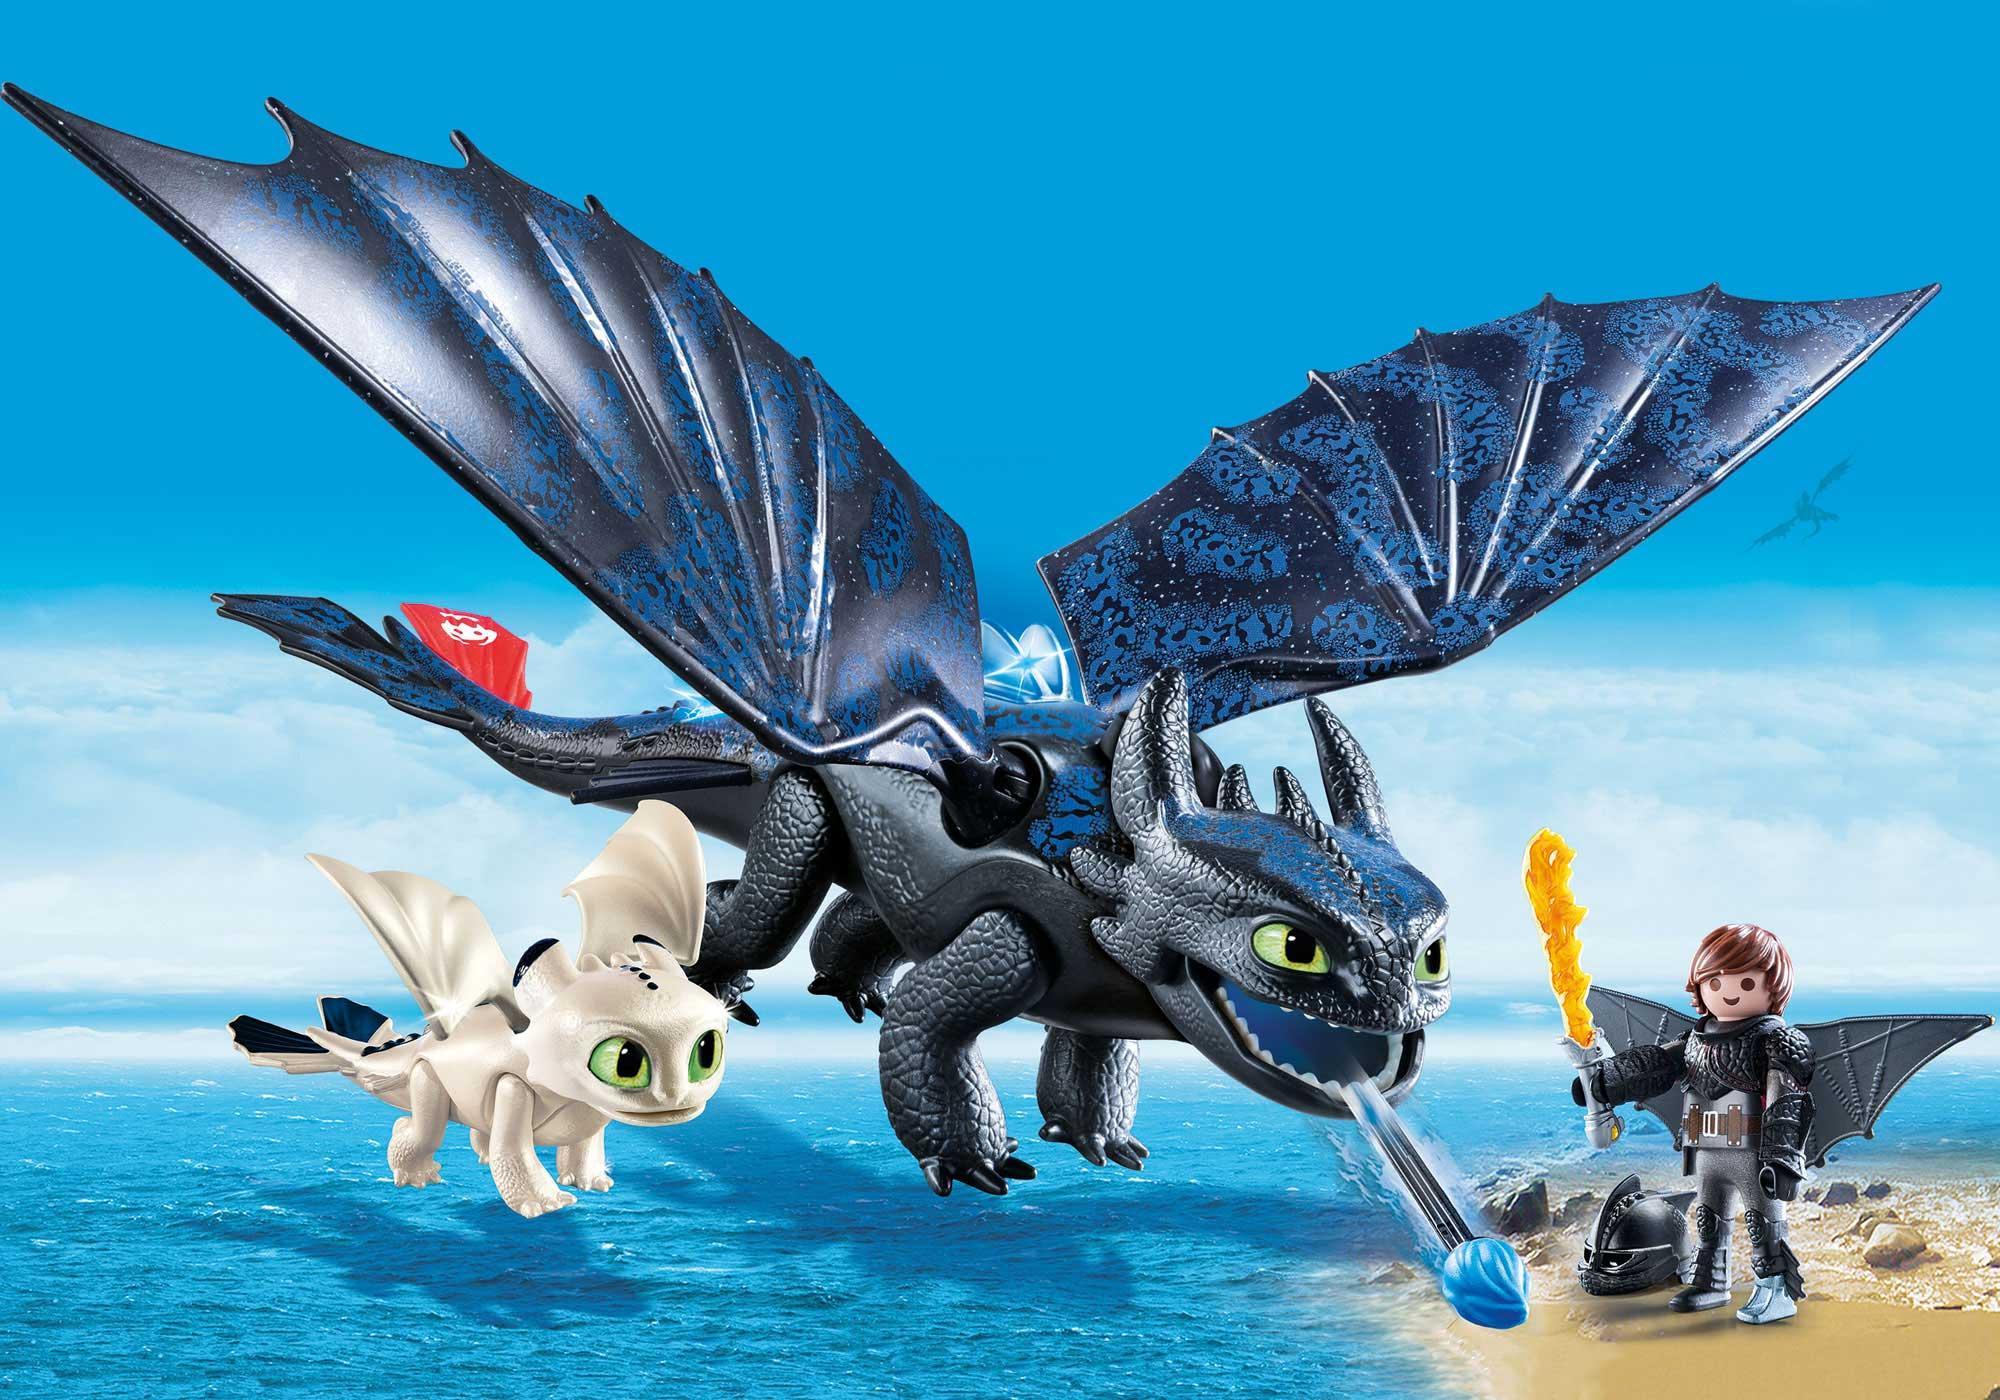 http://media.playmobil.com/i/playmobil/70037_product_detail/Tandloos en Hikkie met  Babydraak